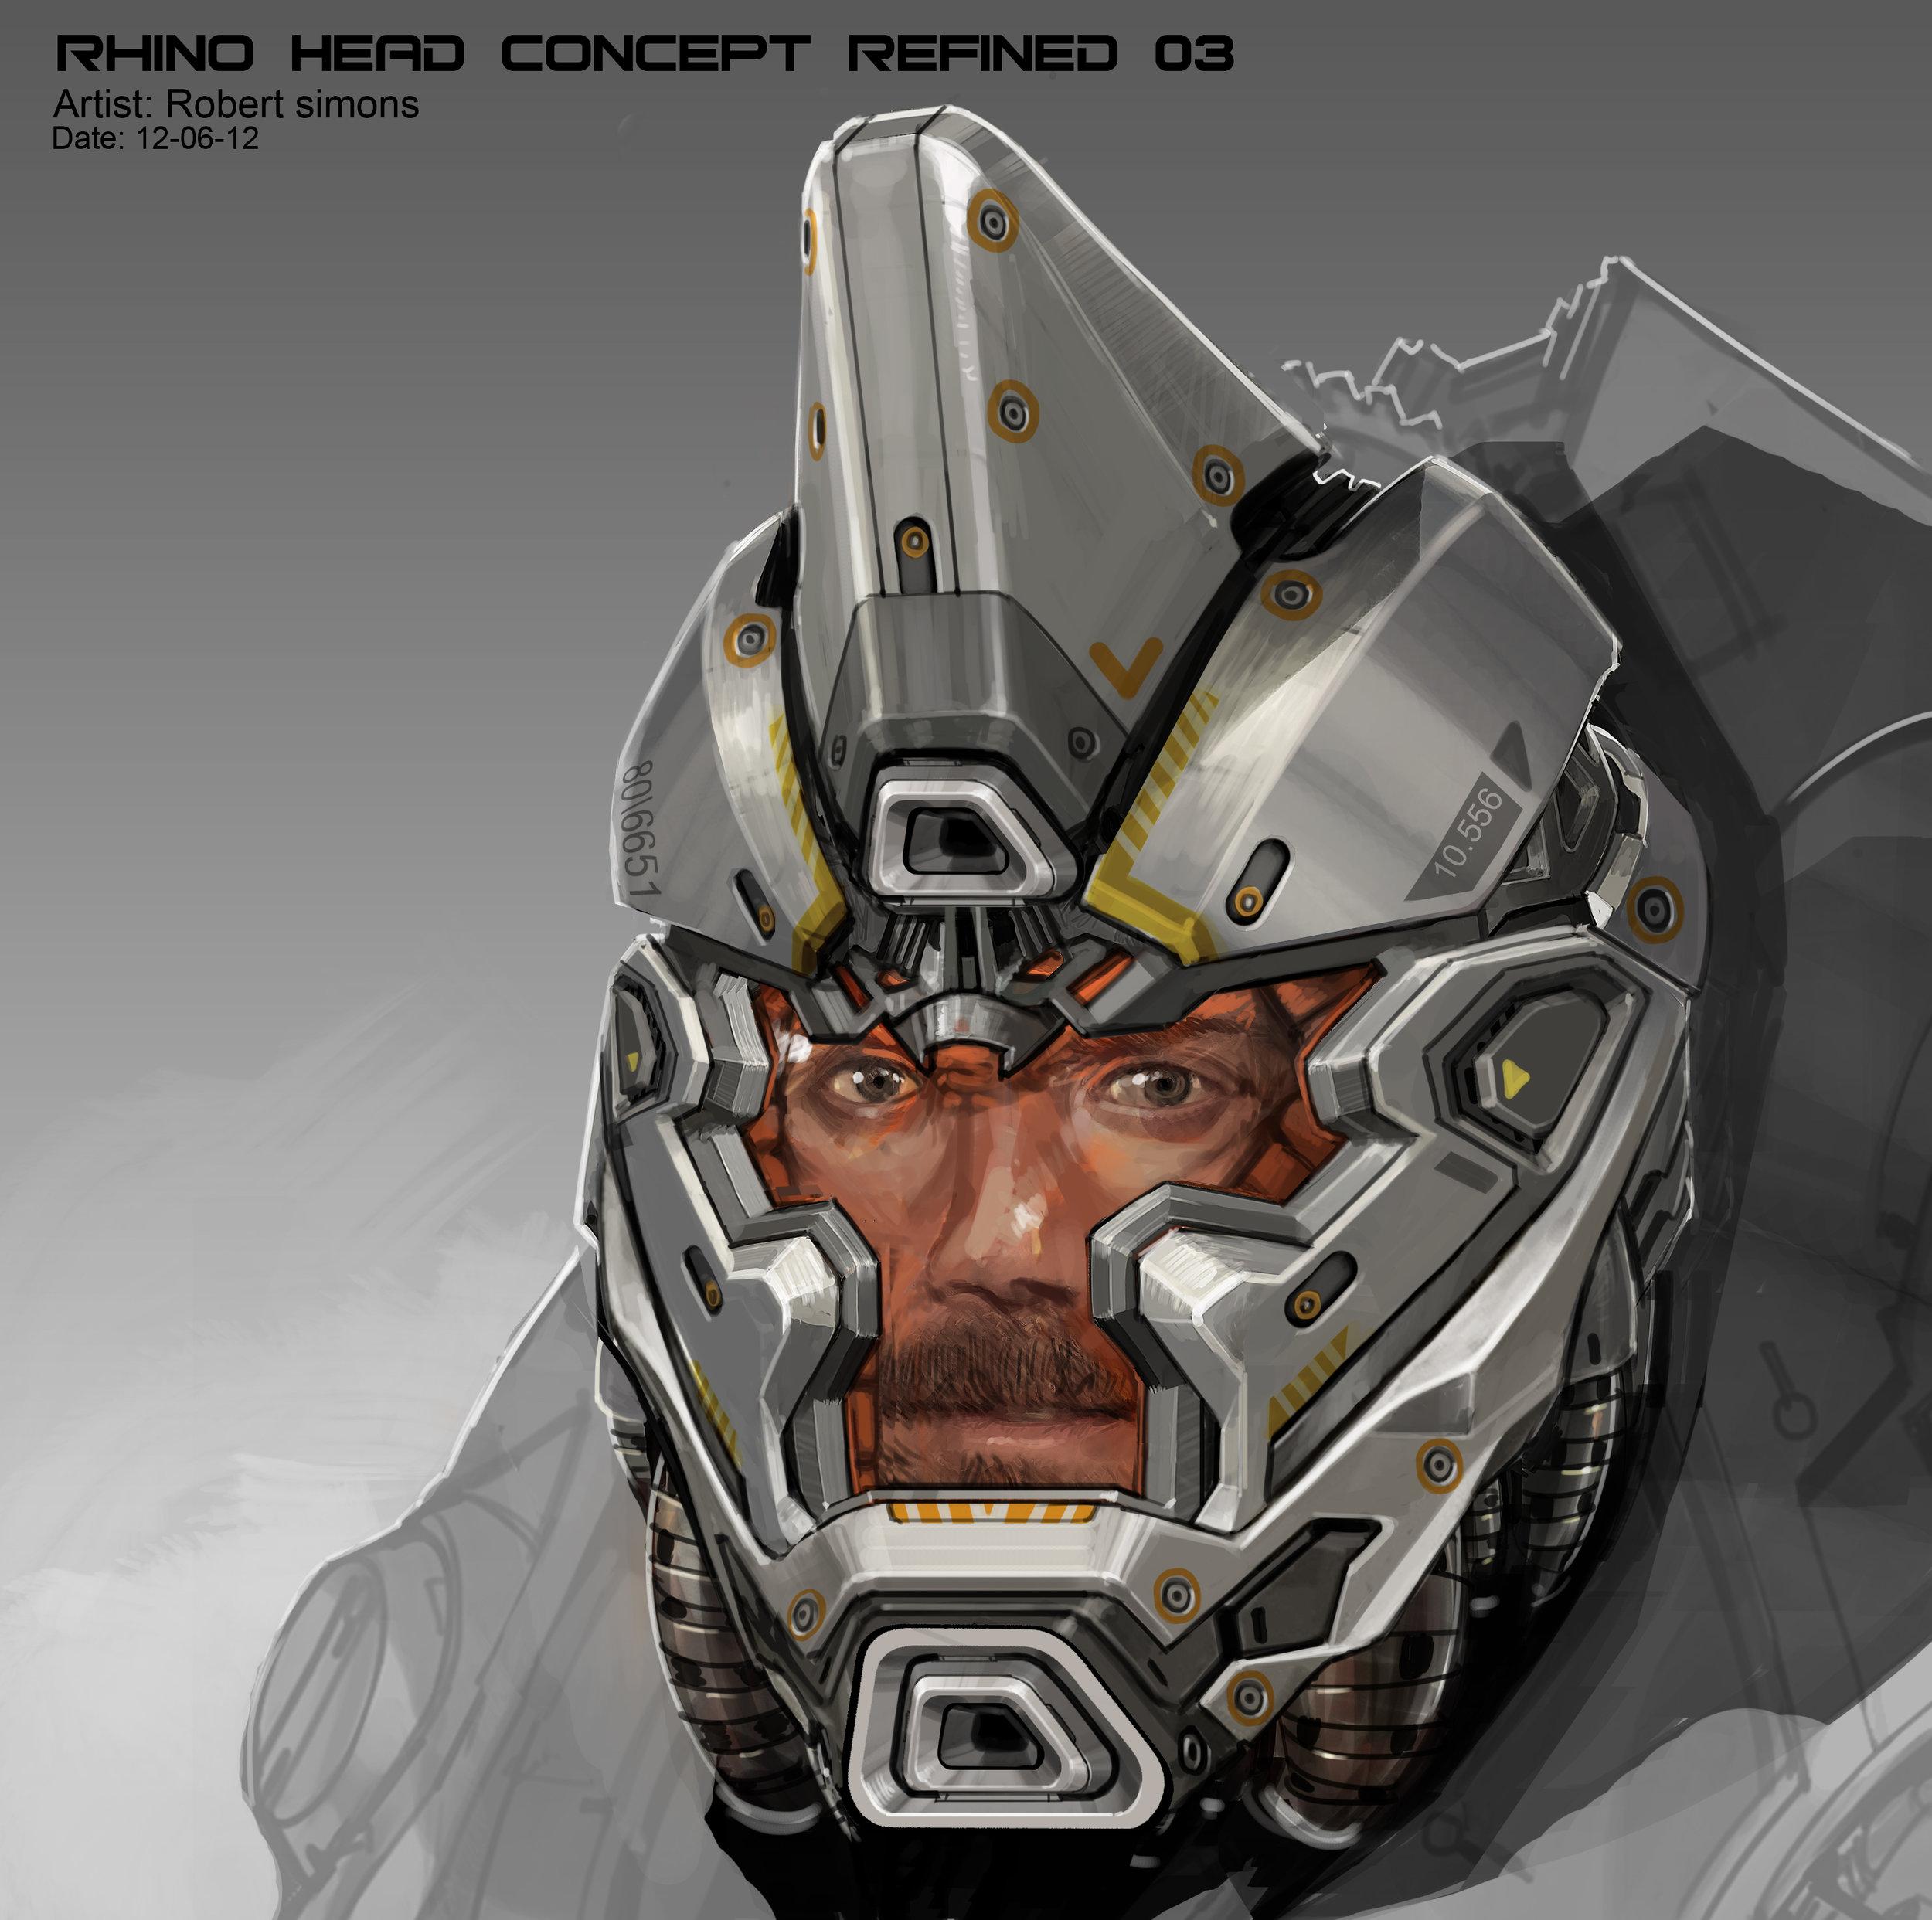 rhino_HeadConceptRefined03_120612_RS.jpg